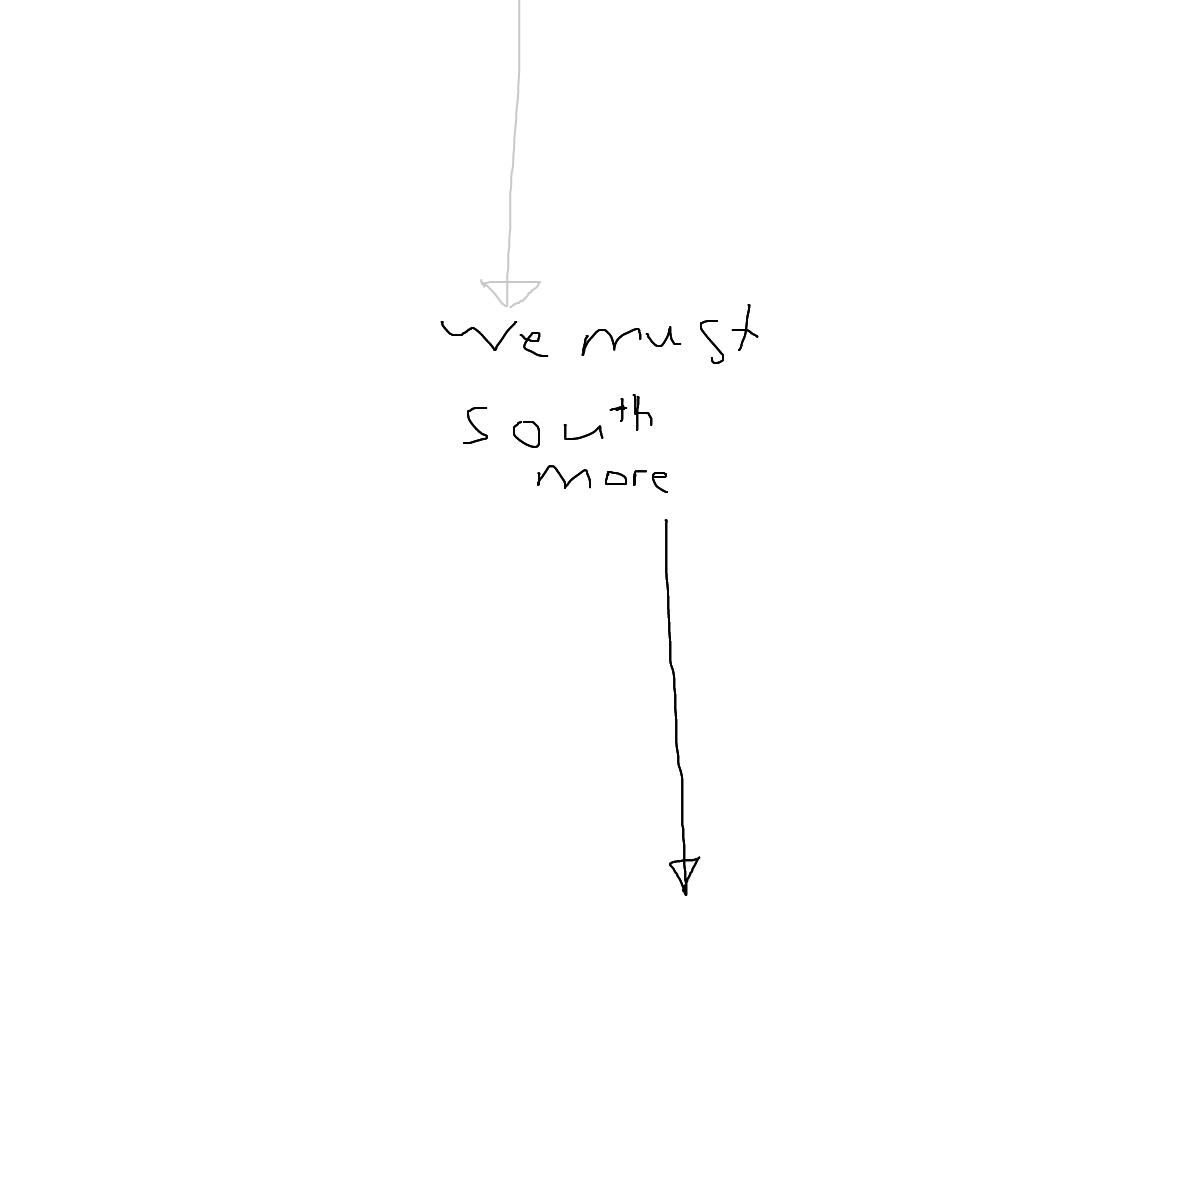 BAAAM drawing#17584 lat:56.5599670410156250lng: 25.4611434936523440